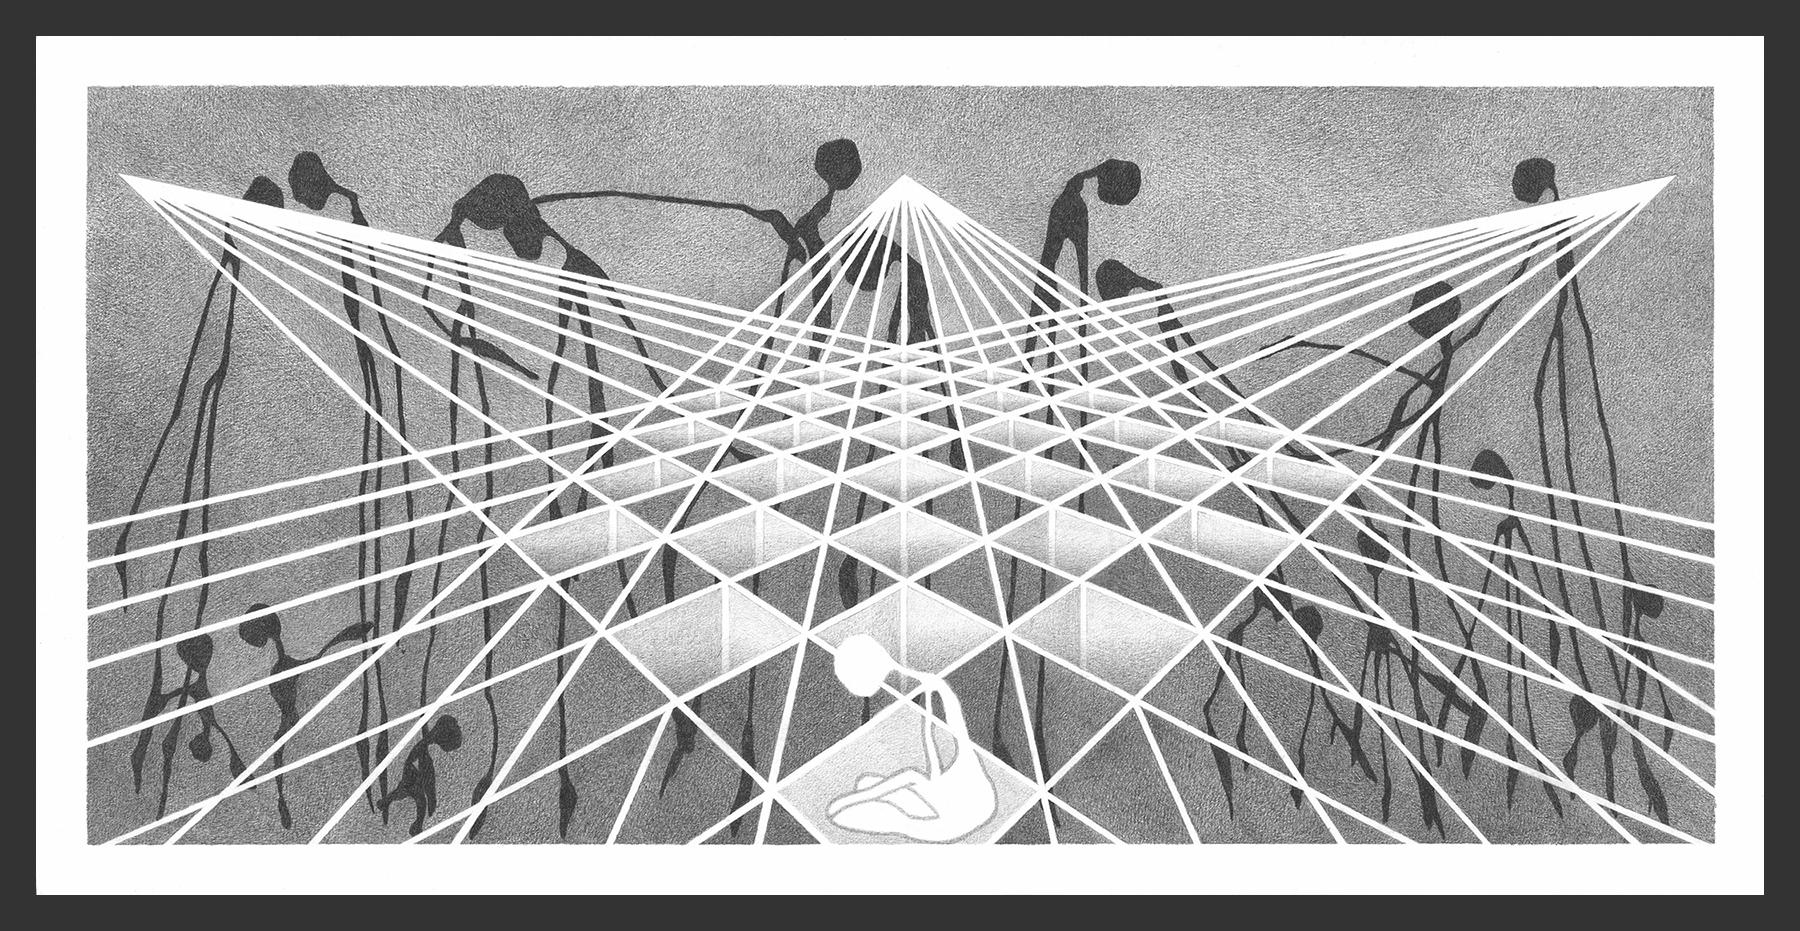 20-Website-Meditation-XX-Graphite-12x24-Astrid-Muller-Karger